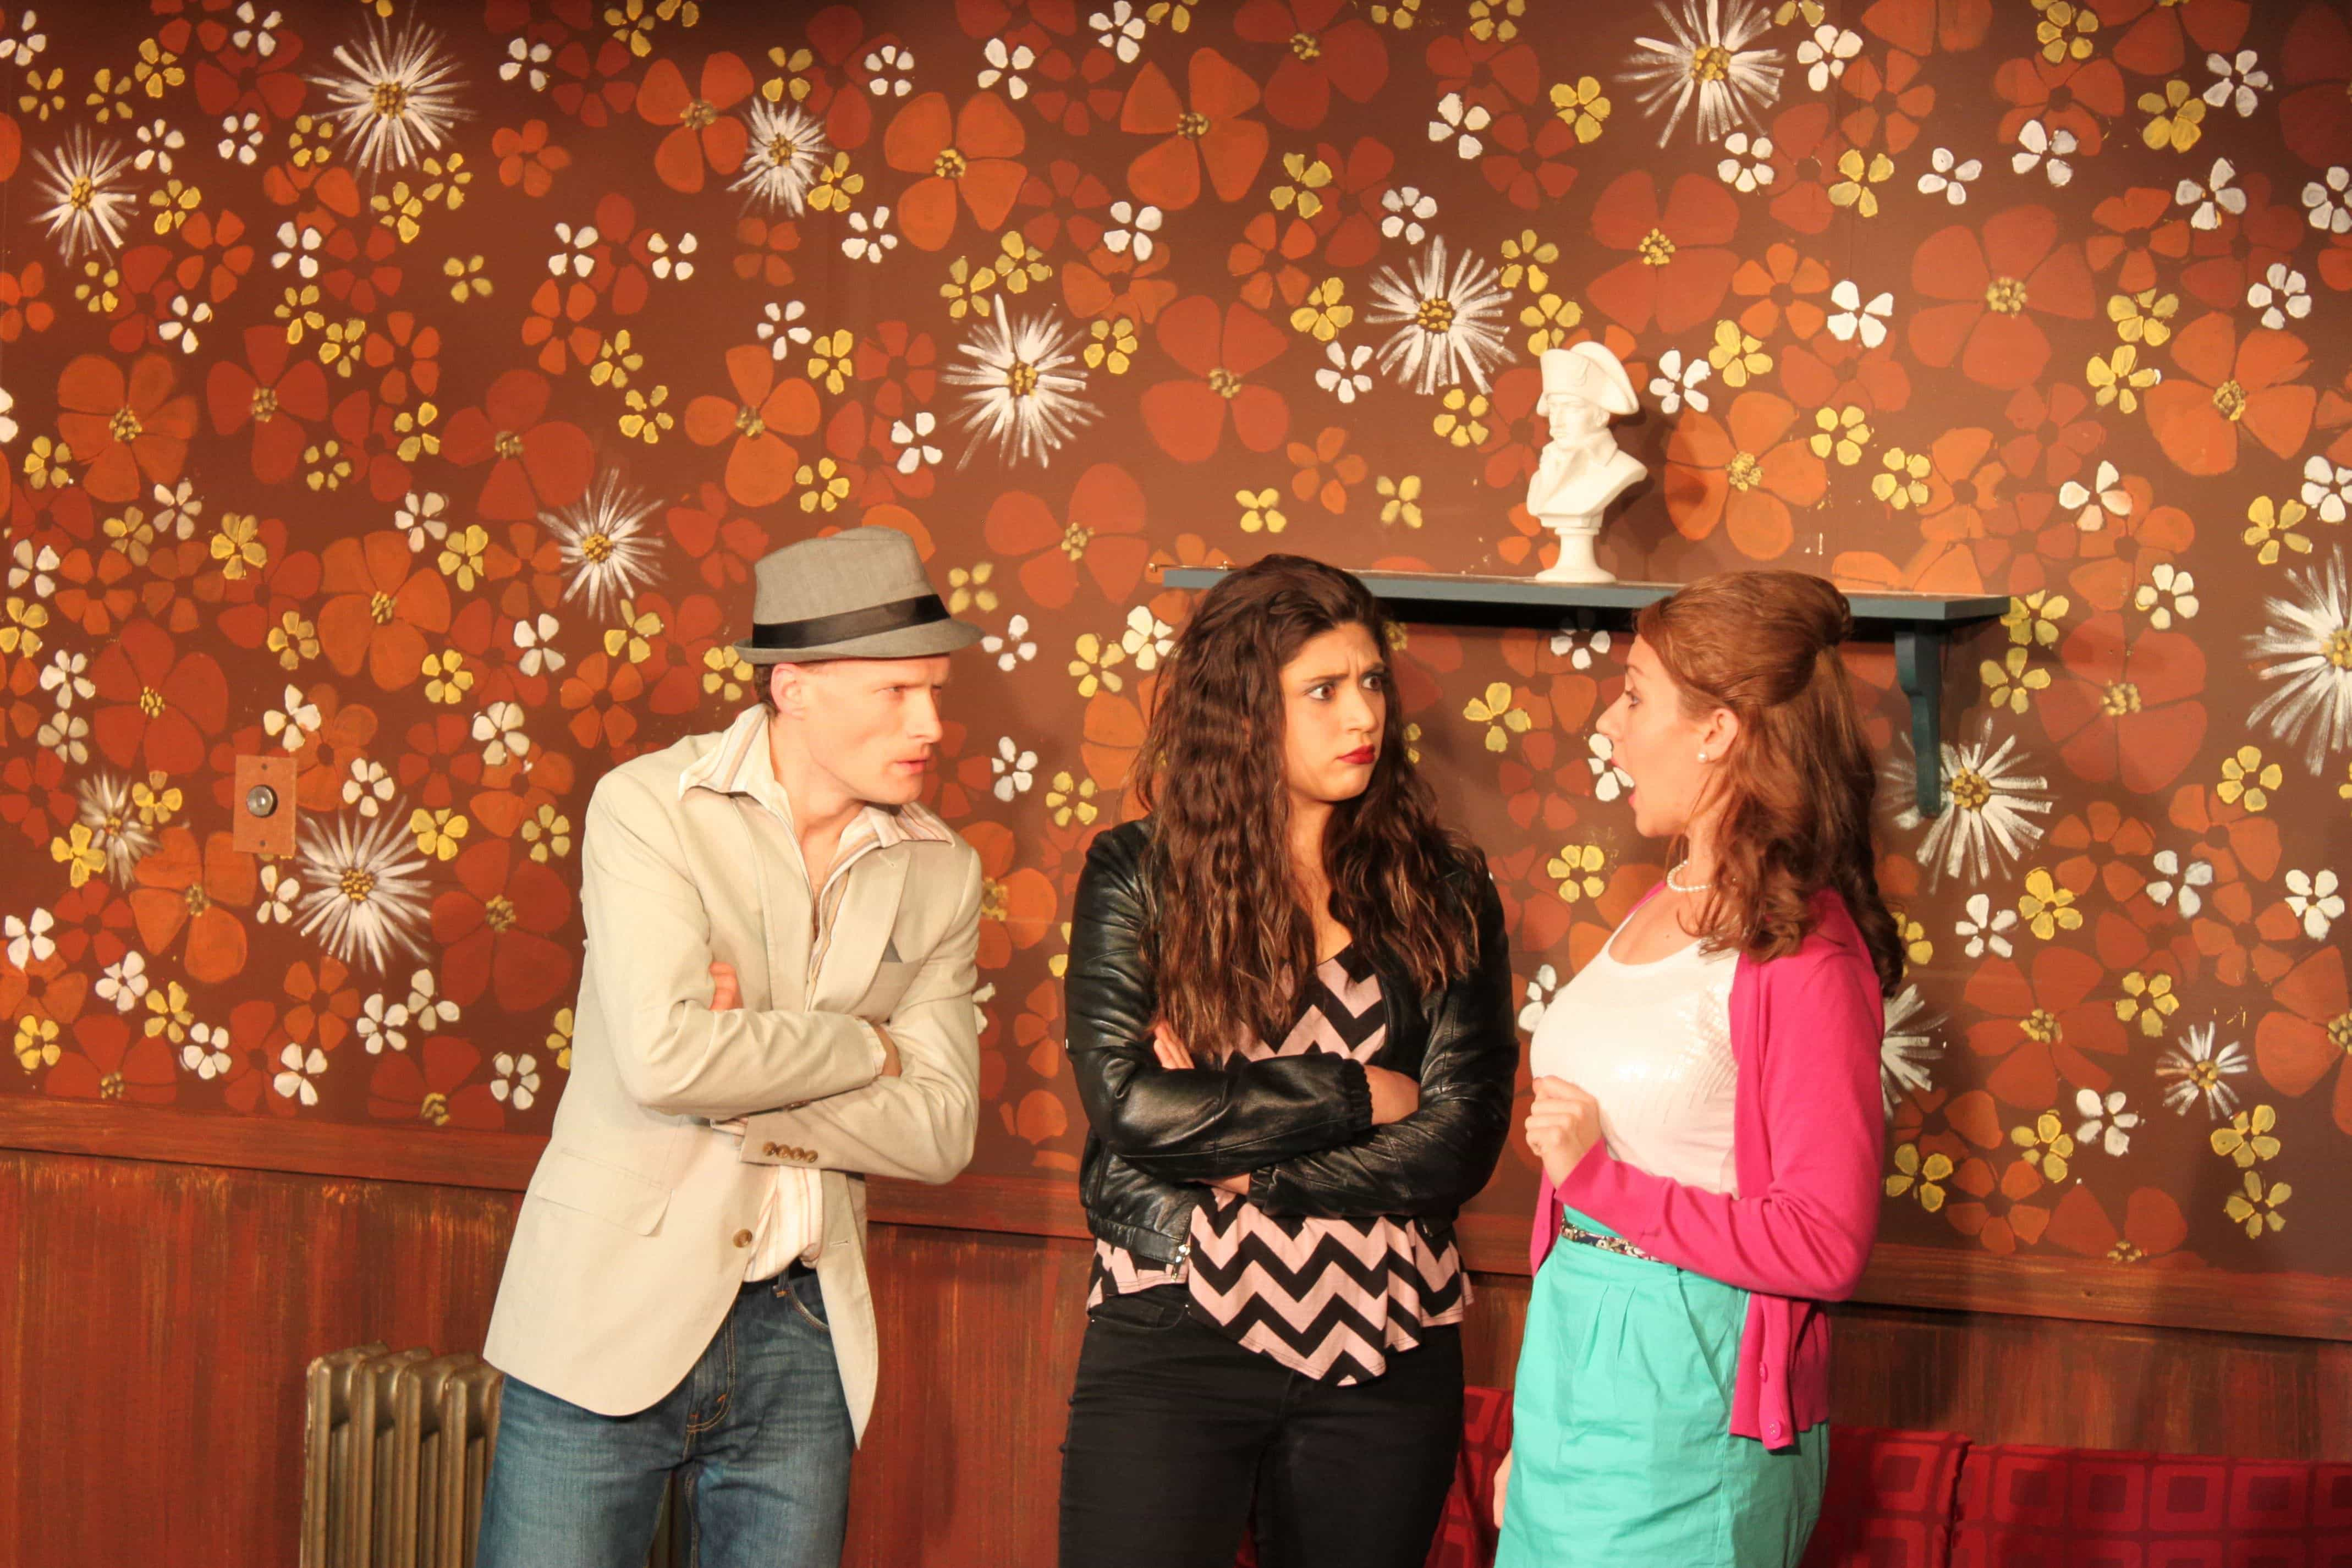 Matt Dundas (Cradeau), Tamara Breuer (Inez), and Jennifer Berry (Estelle). Photo by Toly Yarup.